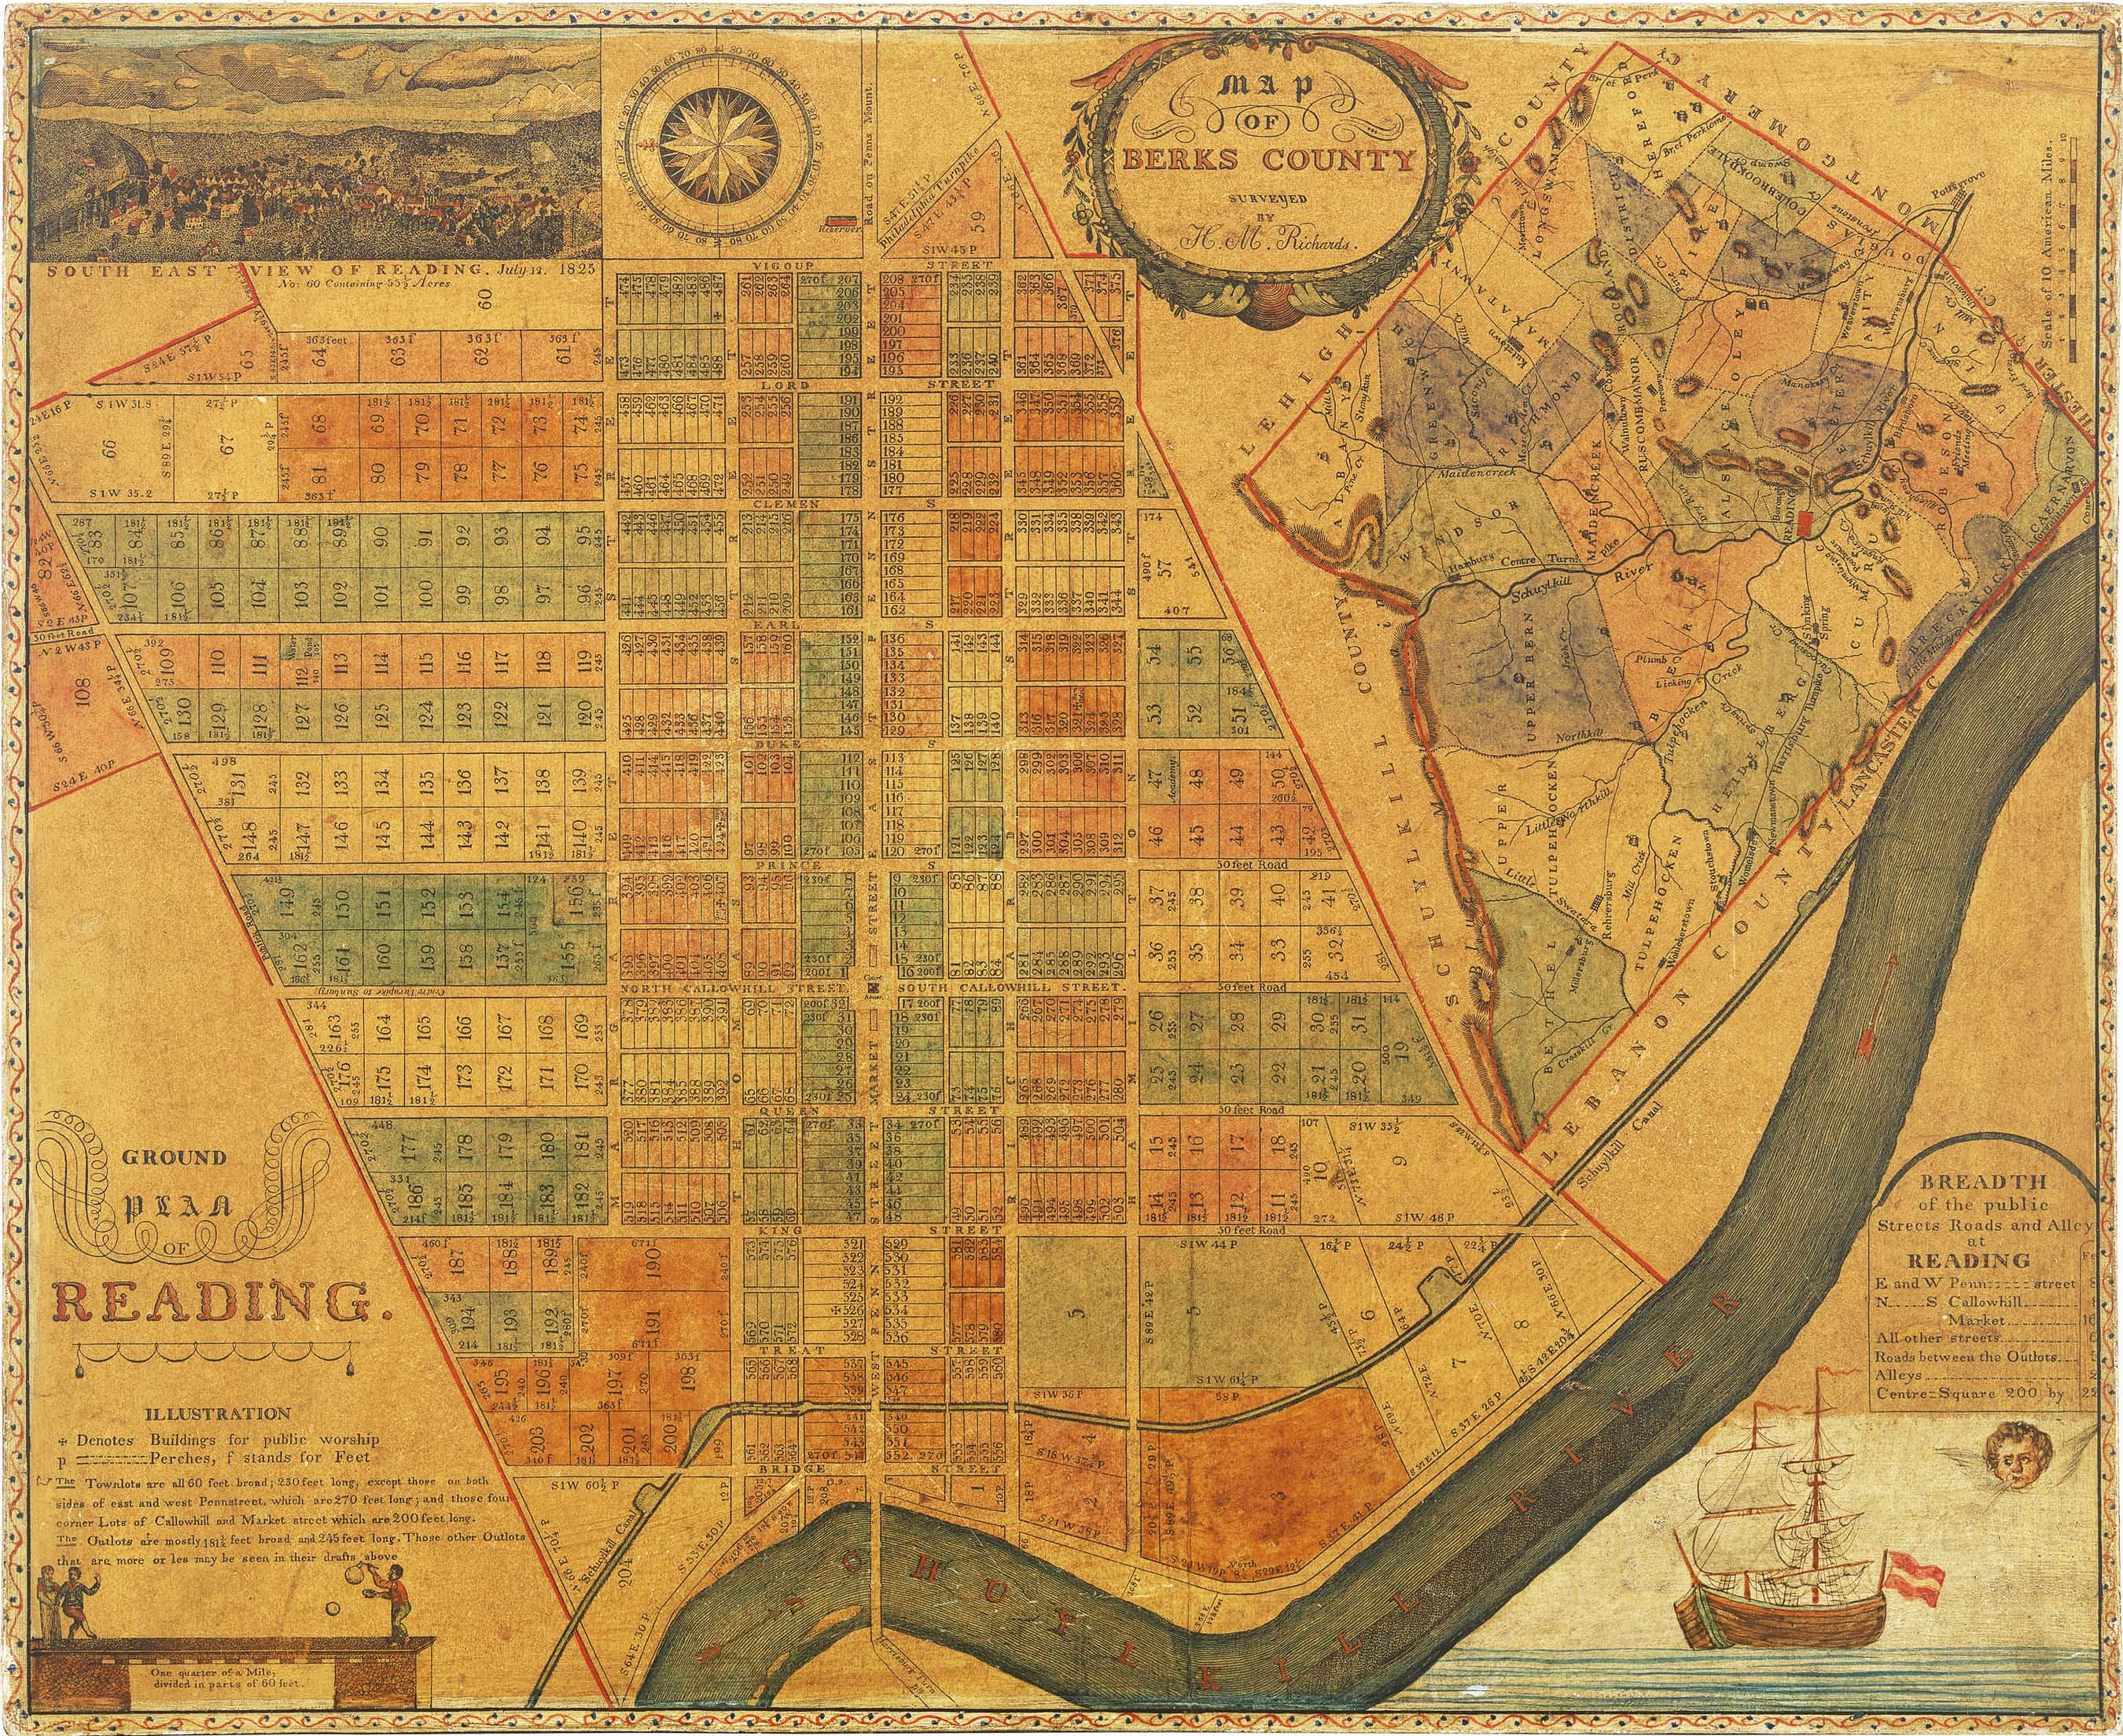 Early map of Reading Pennsylvania with wonderful folk art